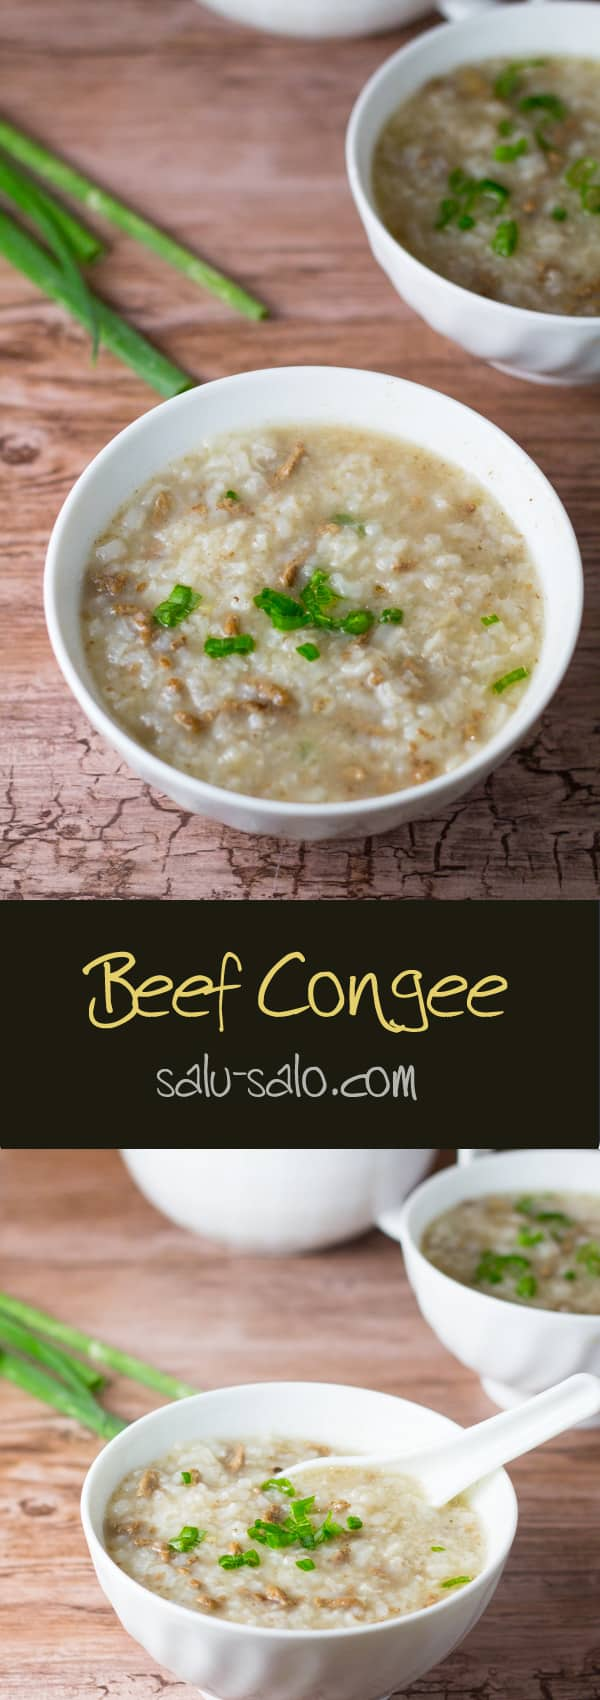 Beef Congee